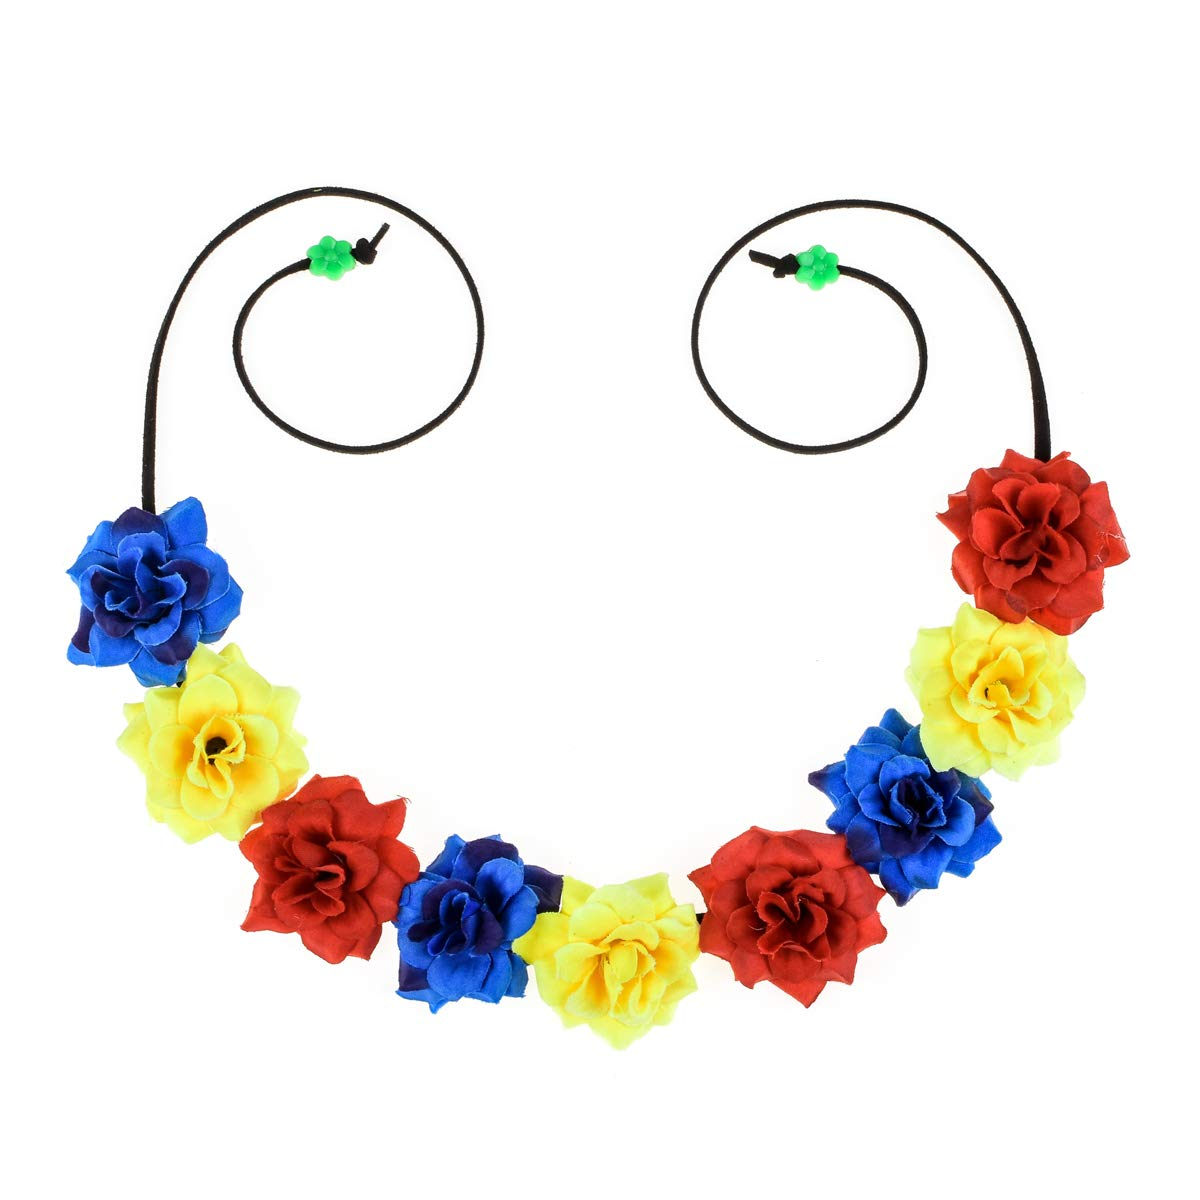 June Bloomy Women Rose Floral Crown BOHO Flower Headband Hair Wreath (Style B Red Yellow Blue)